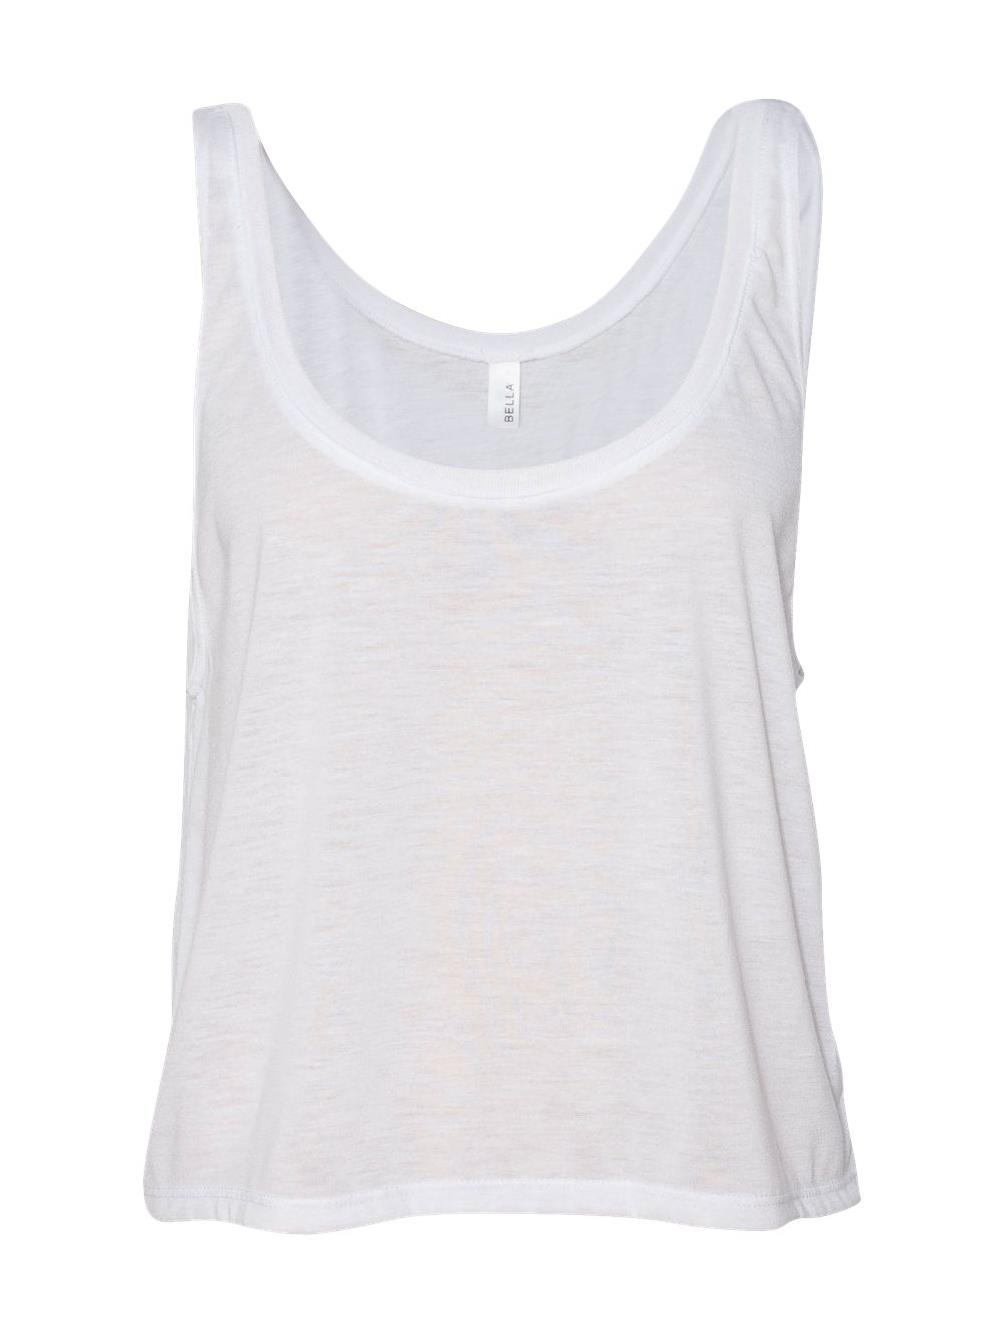 Bella + Canvas T-Shirts Women's Flowy Boxy Tank 8880